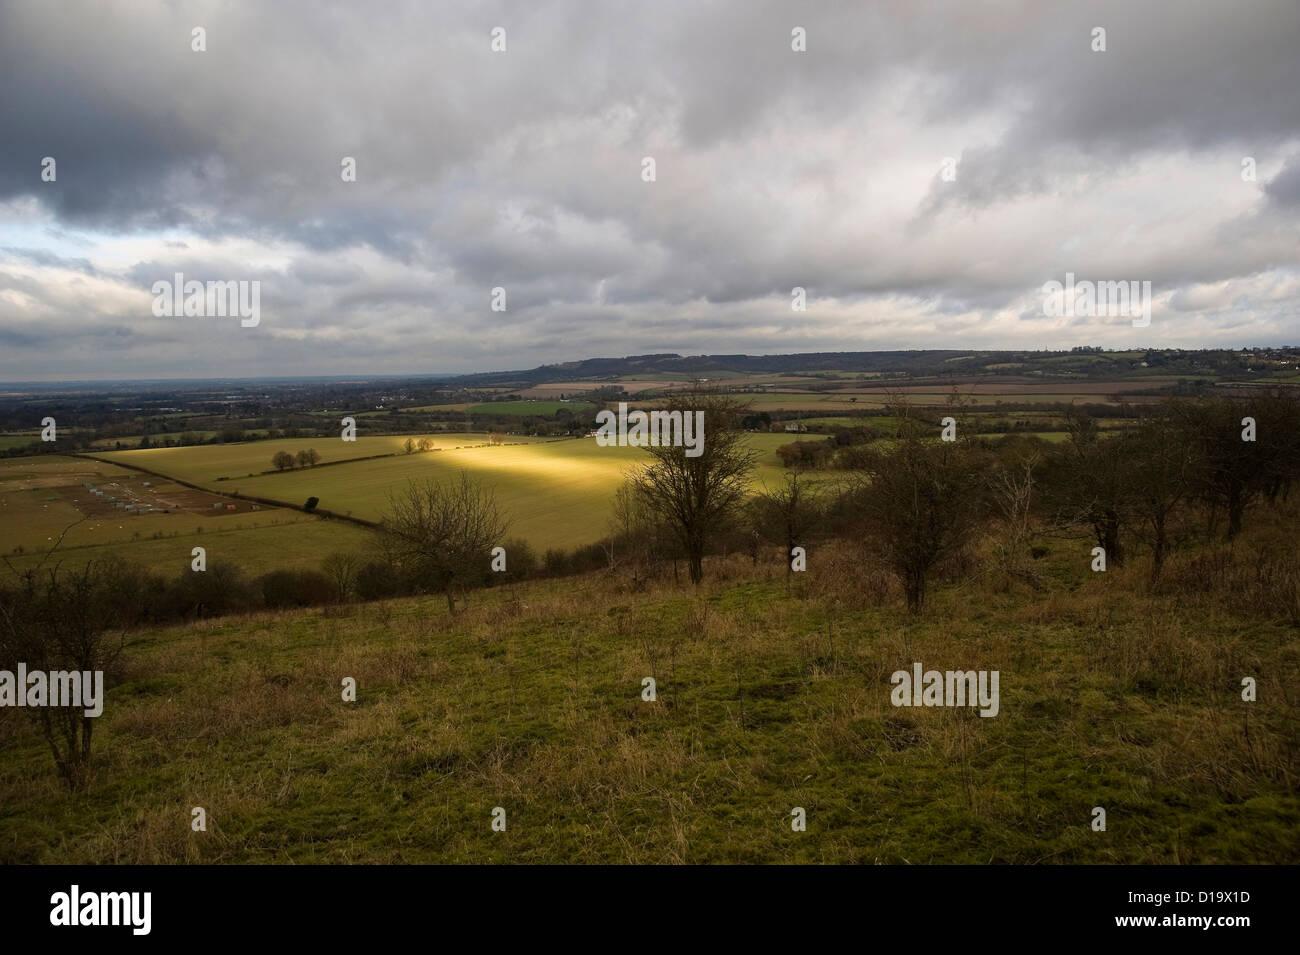 A beam of light moves across fields near The Ridgeway National Trail near Chinnor, Buckinghamshire, UK - Stock Image